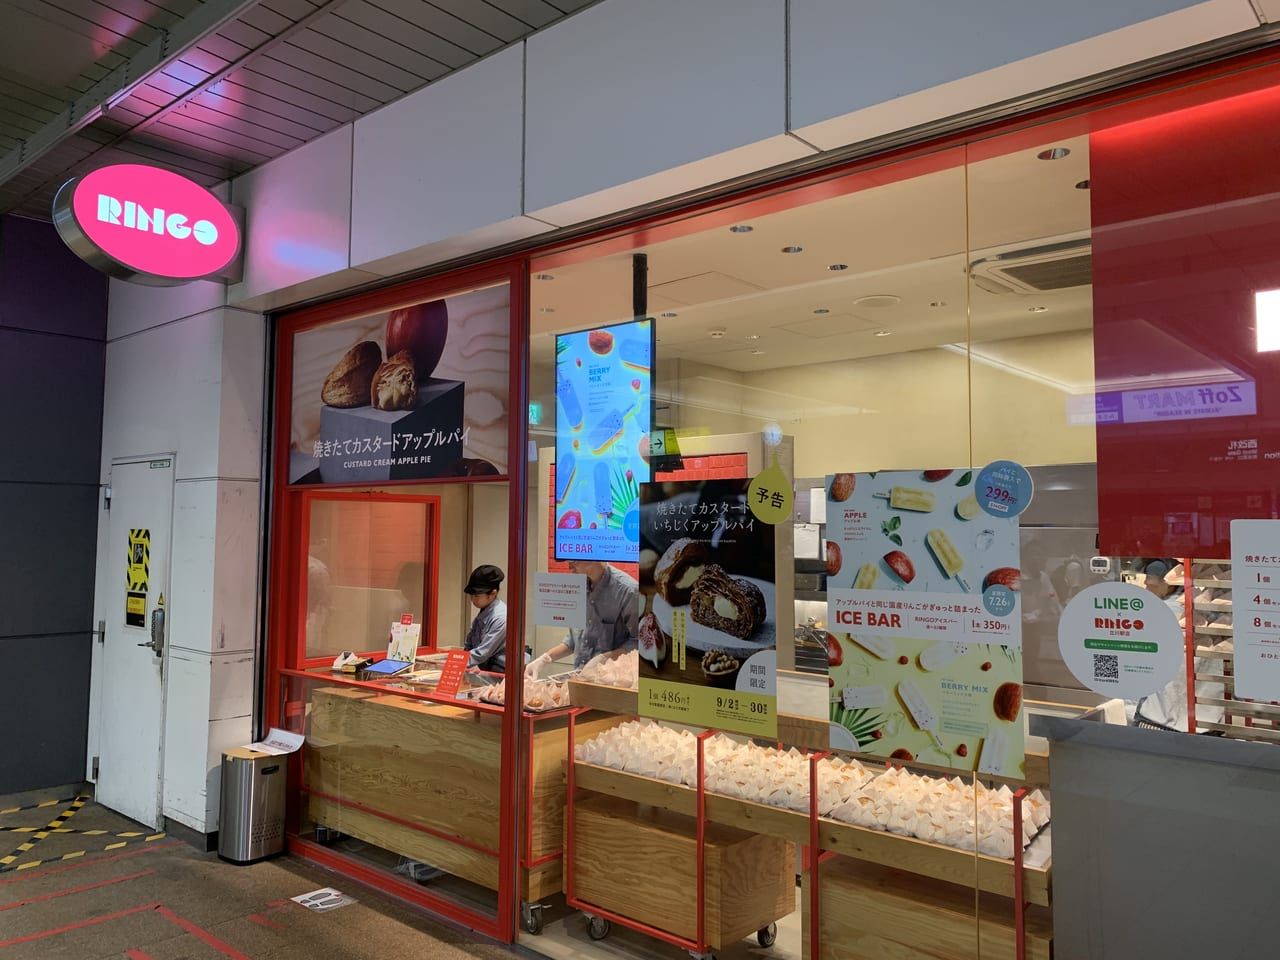 RINGO立川店